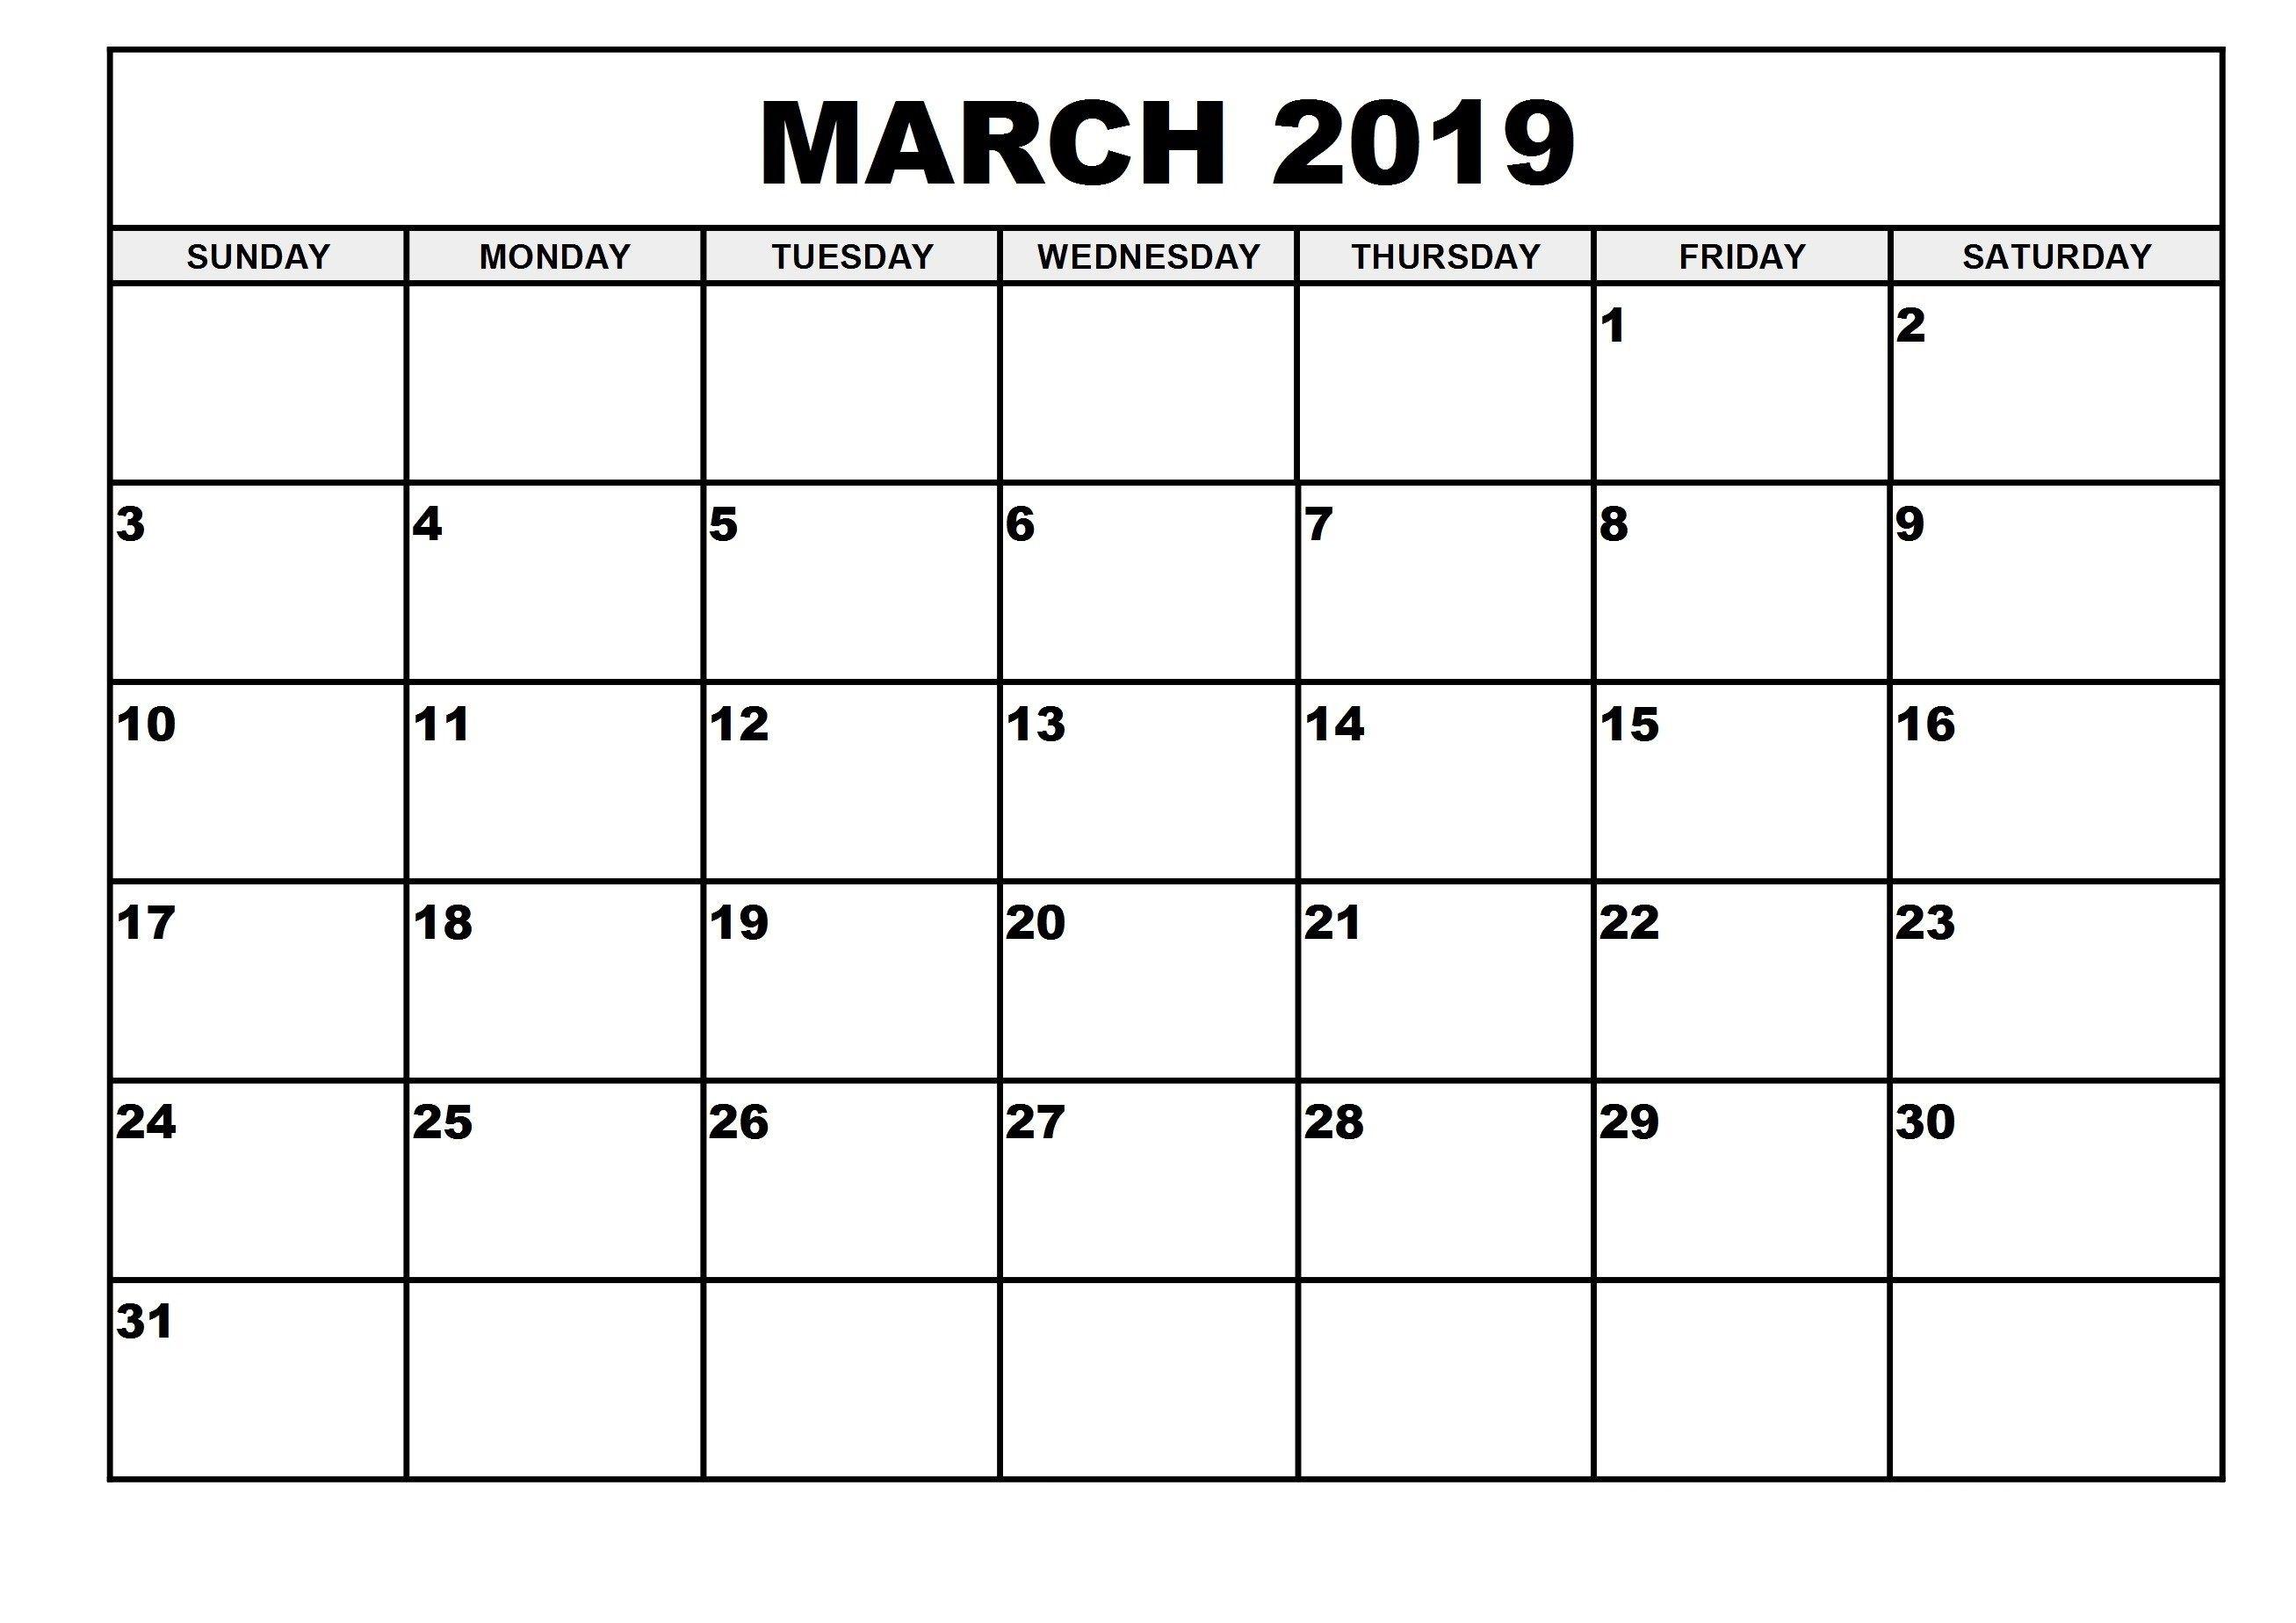 March 2019 Printable Calendar For Word Waterproof | Free